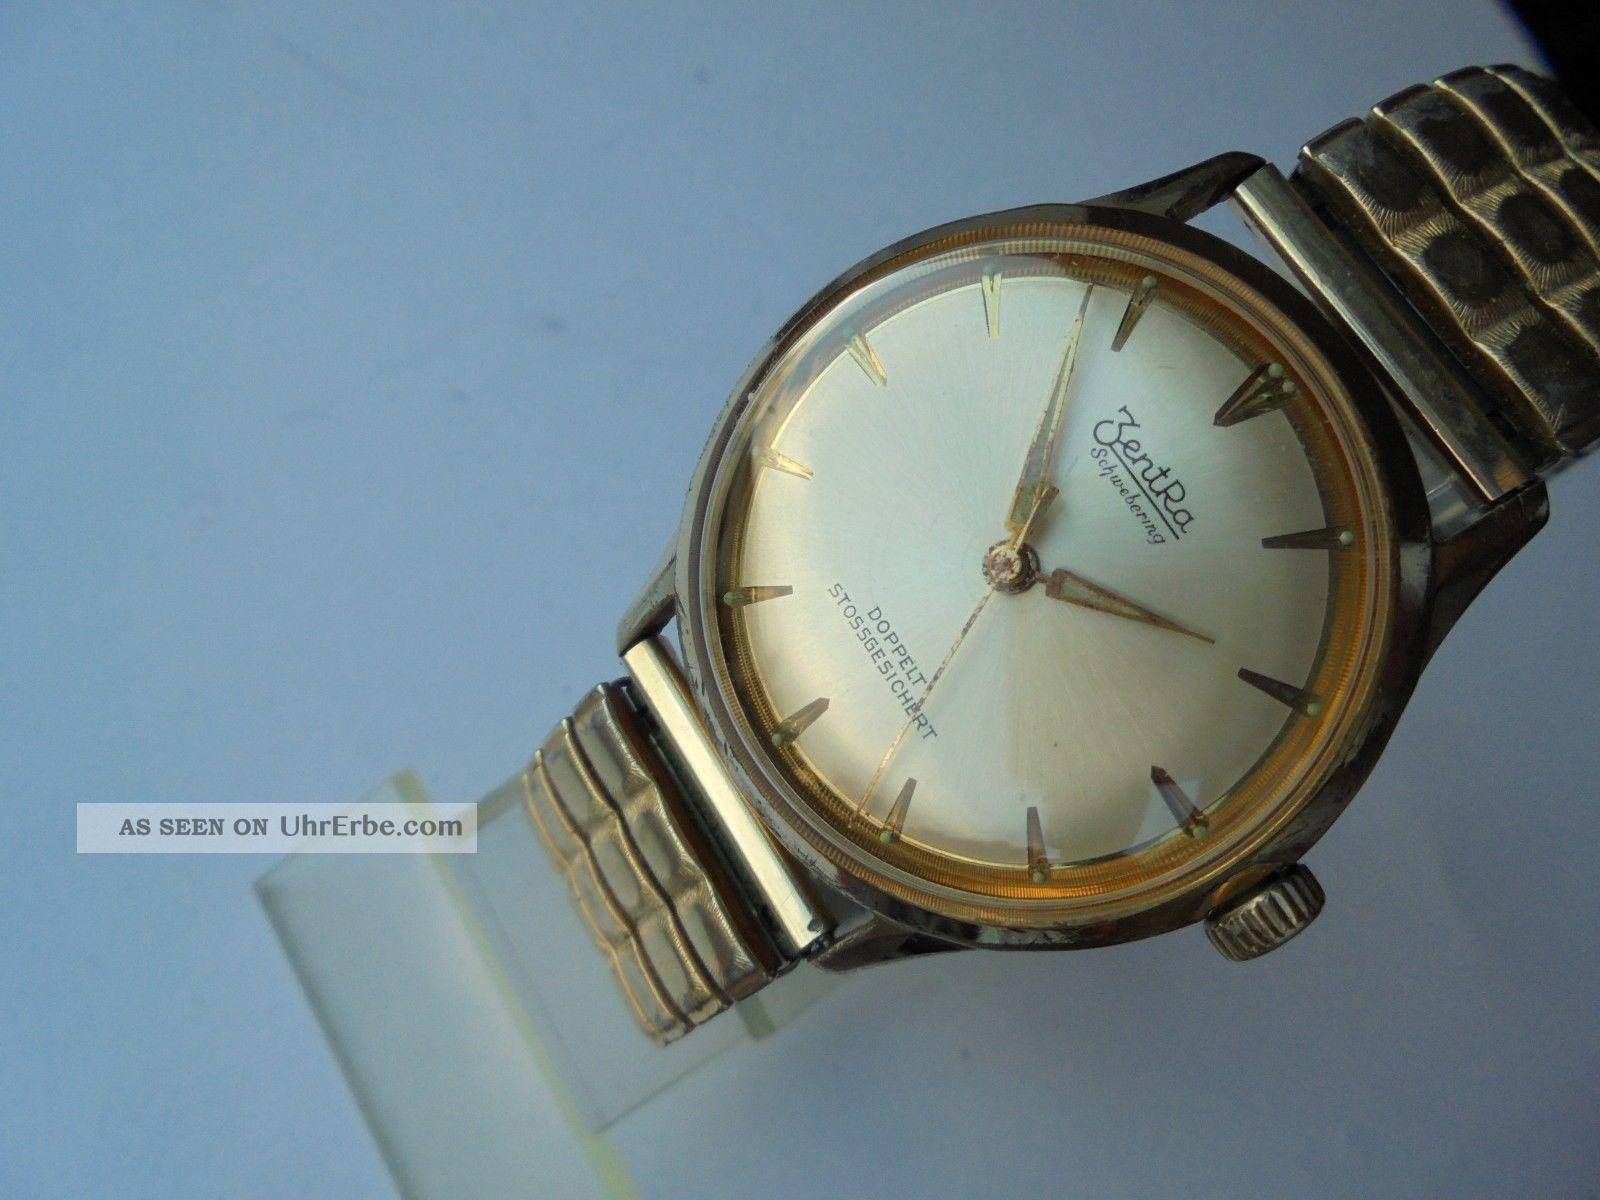 Interessante Ca.  60 Jahre Alte Zentra Schwebering Herrenuhr,  Kal.  Puw 60 - 61, Armbanduhren Bild